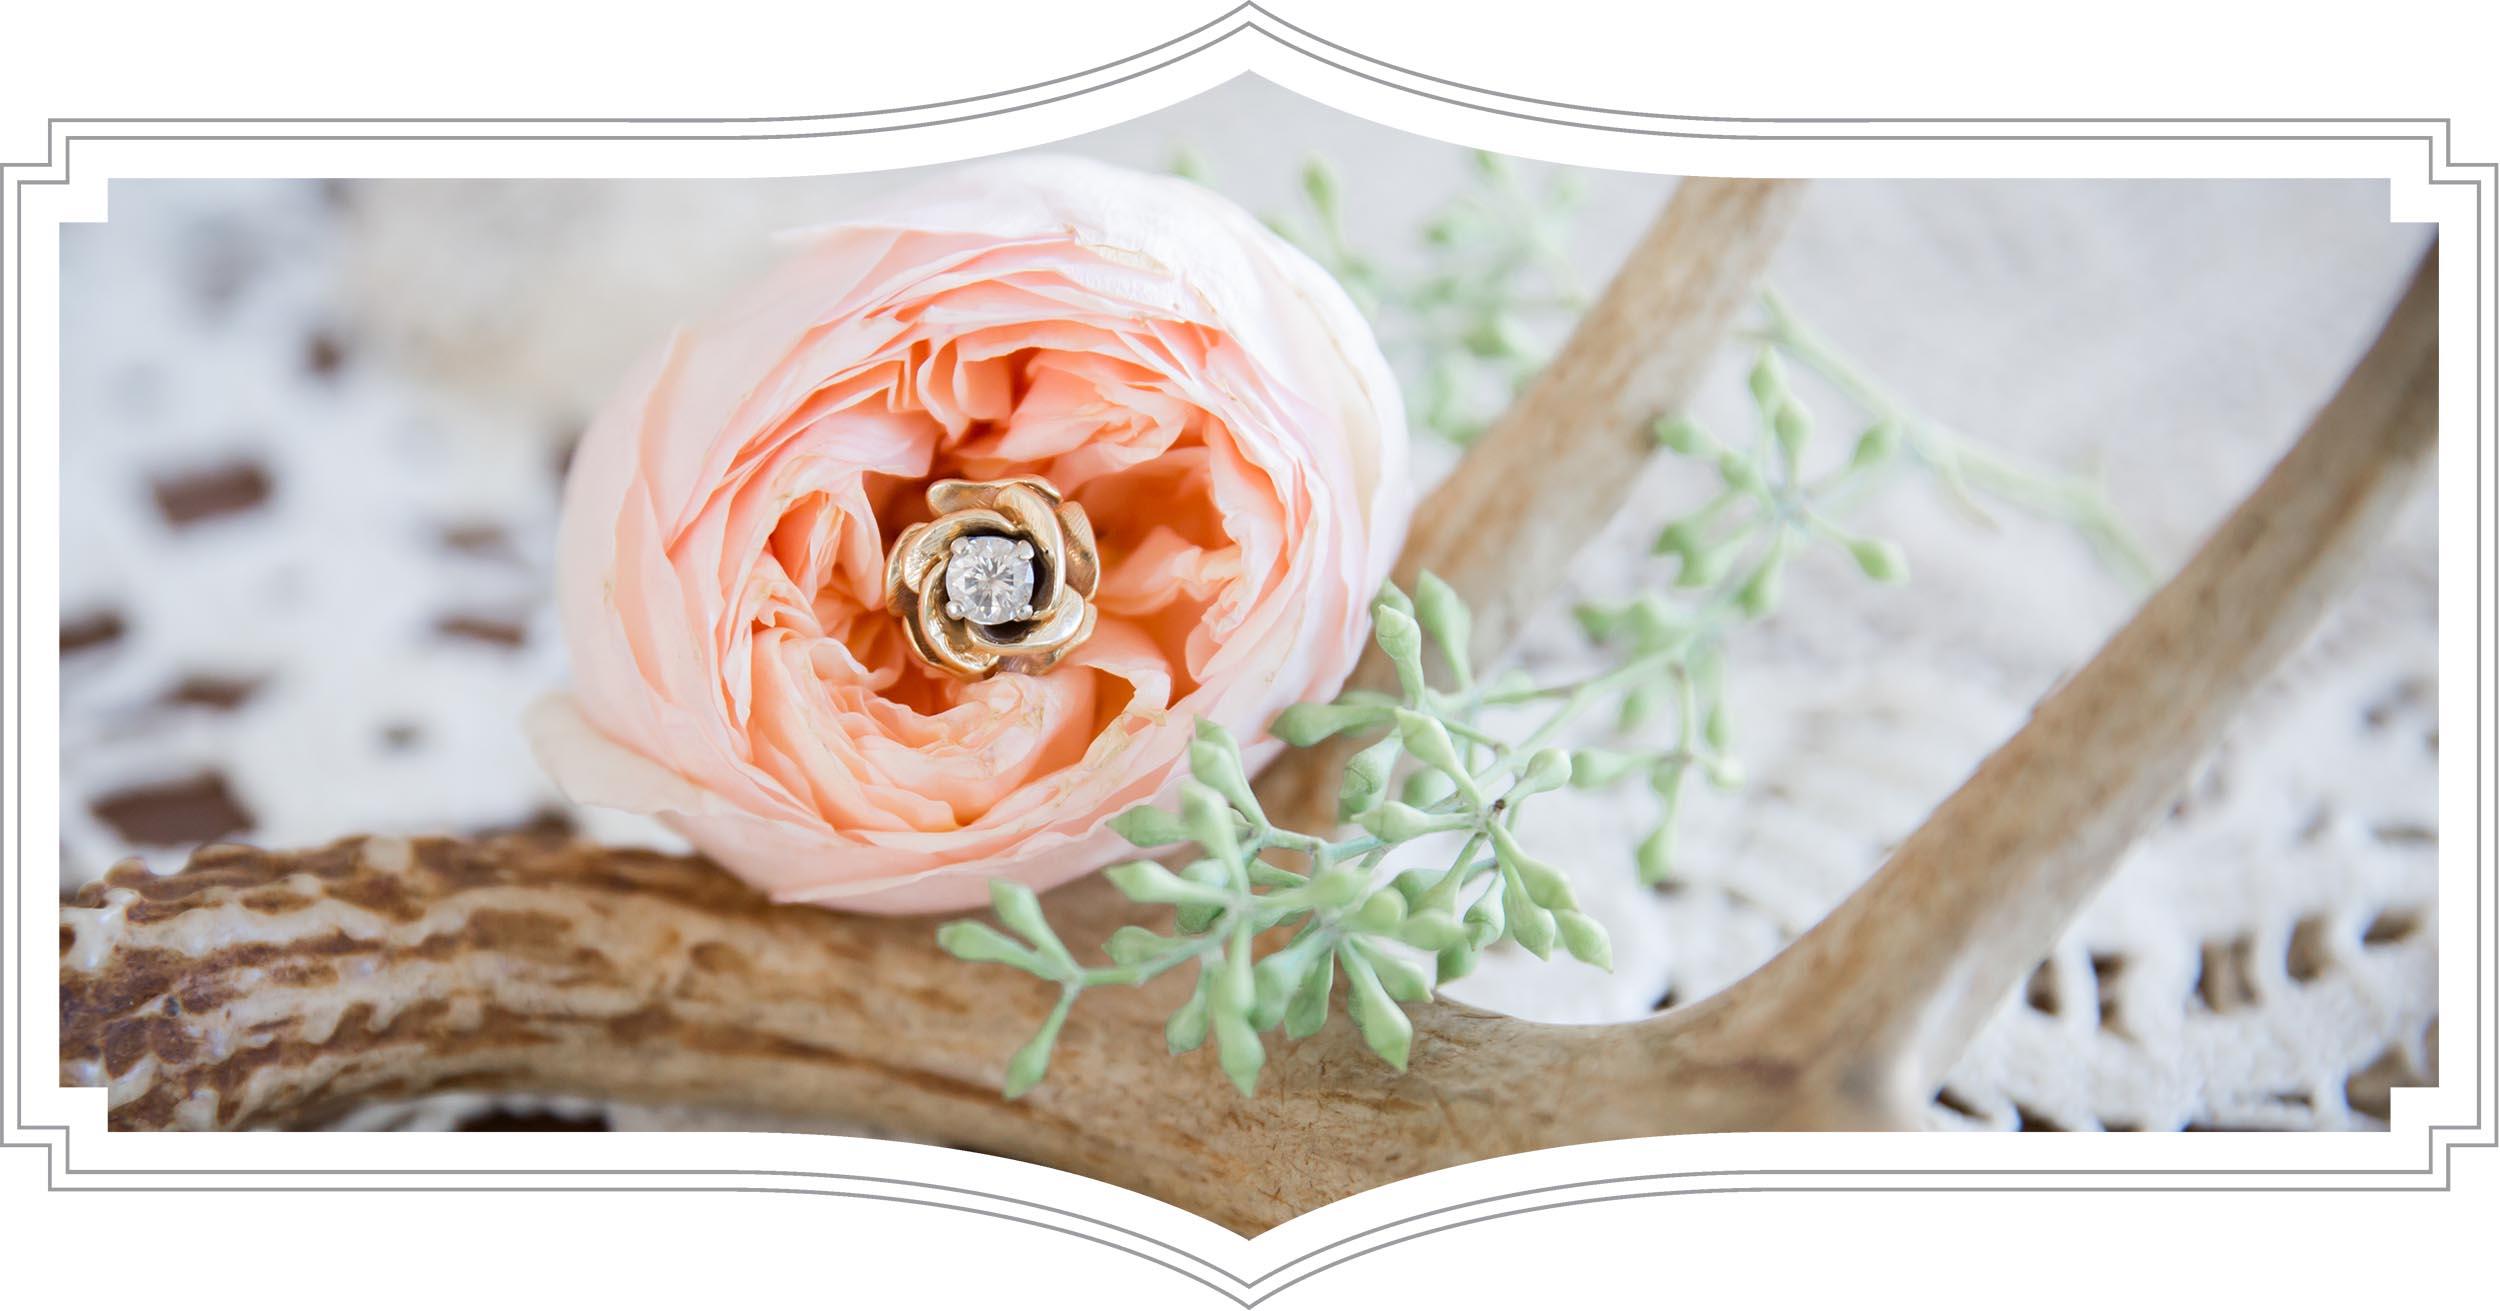 home-page-header-flower.jpg